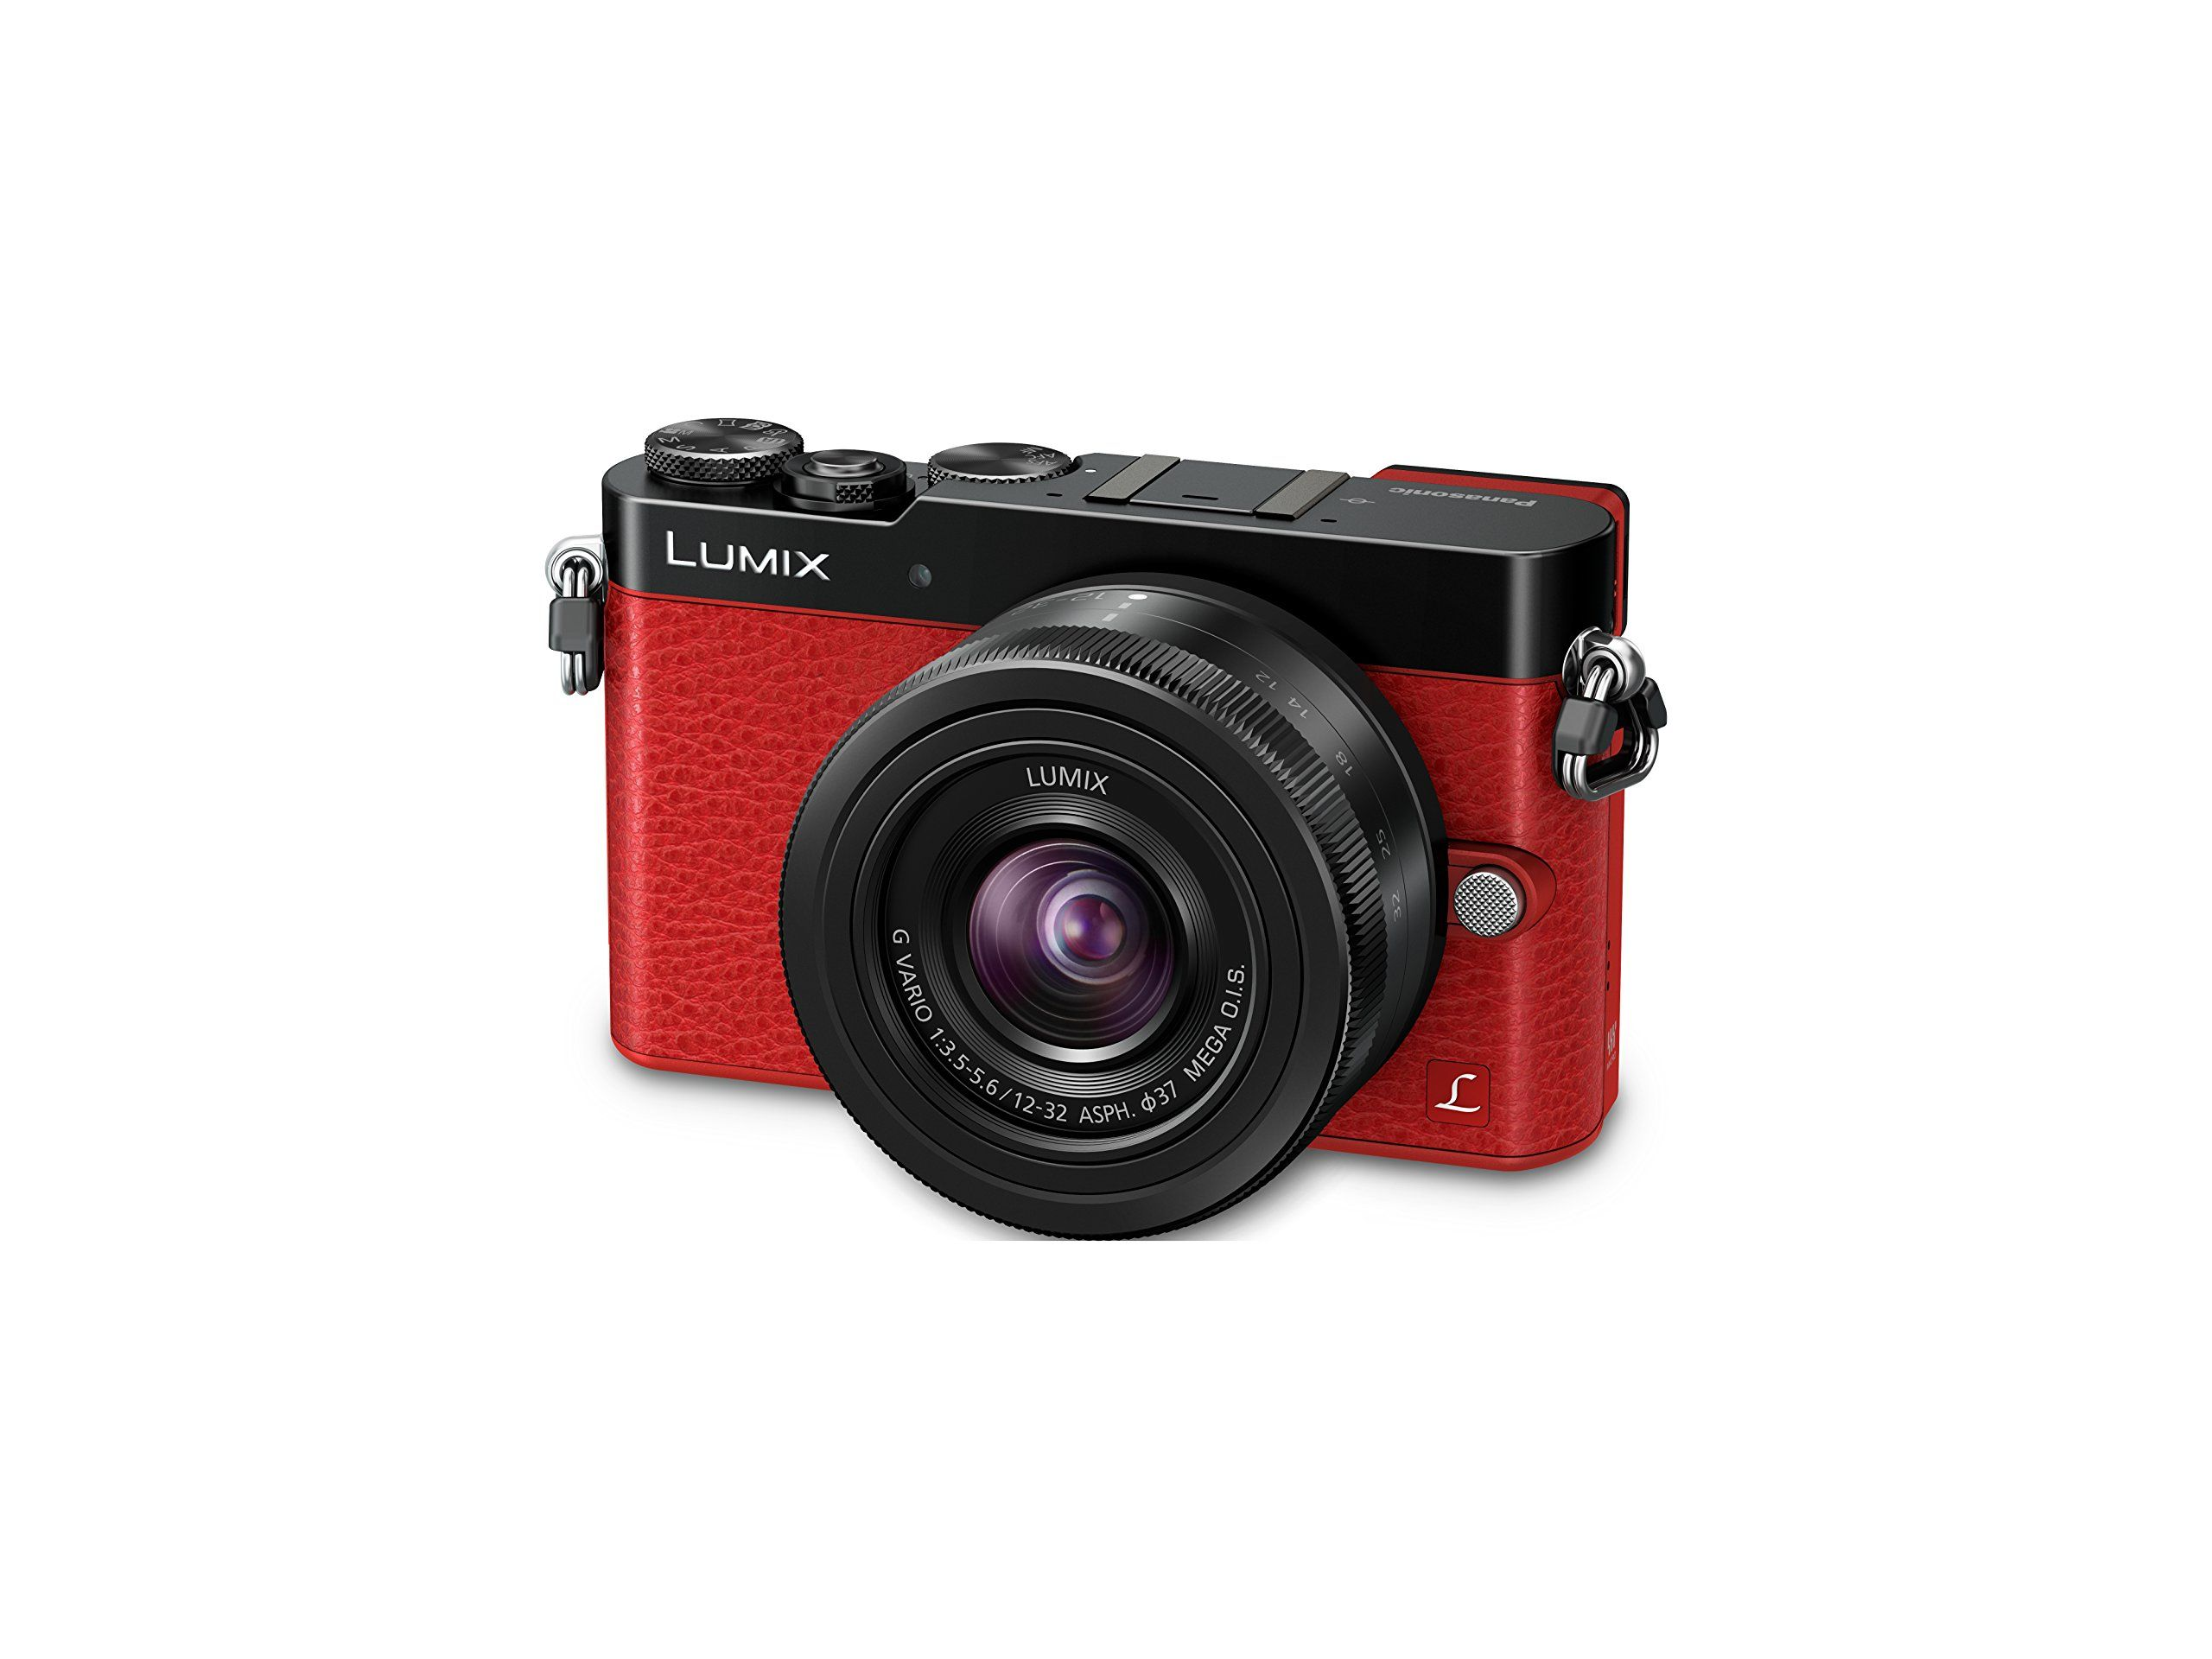 Robot Check Panasonic Lumix Mirrorless Camera Camera